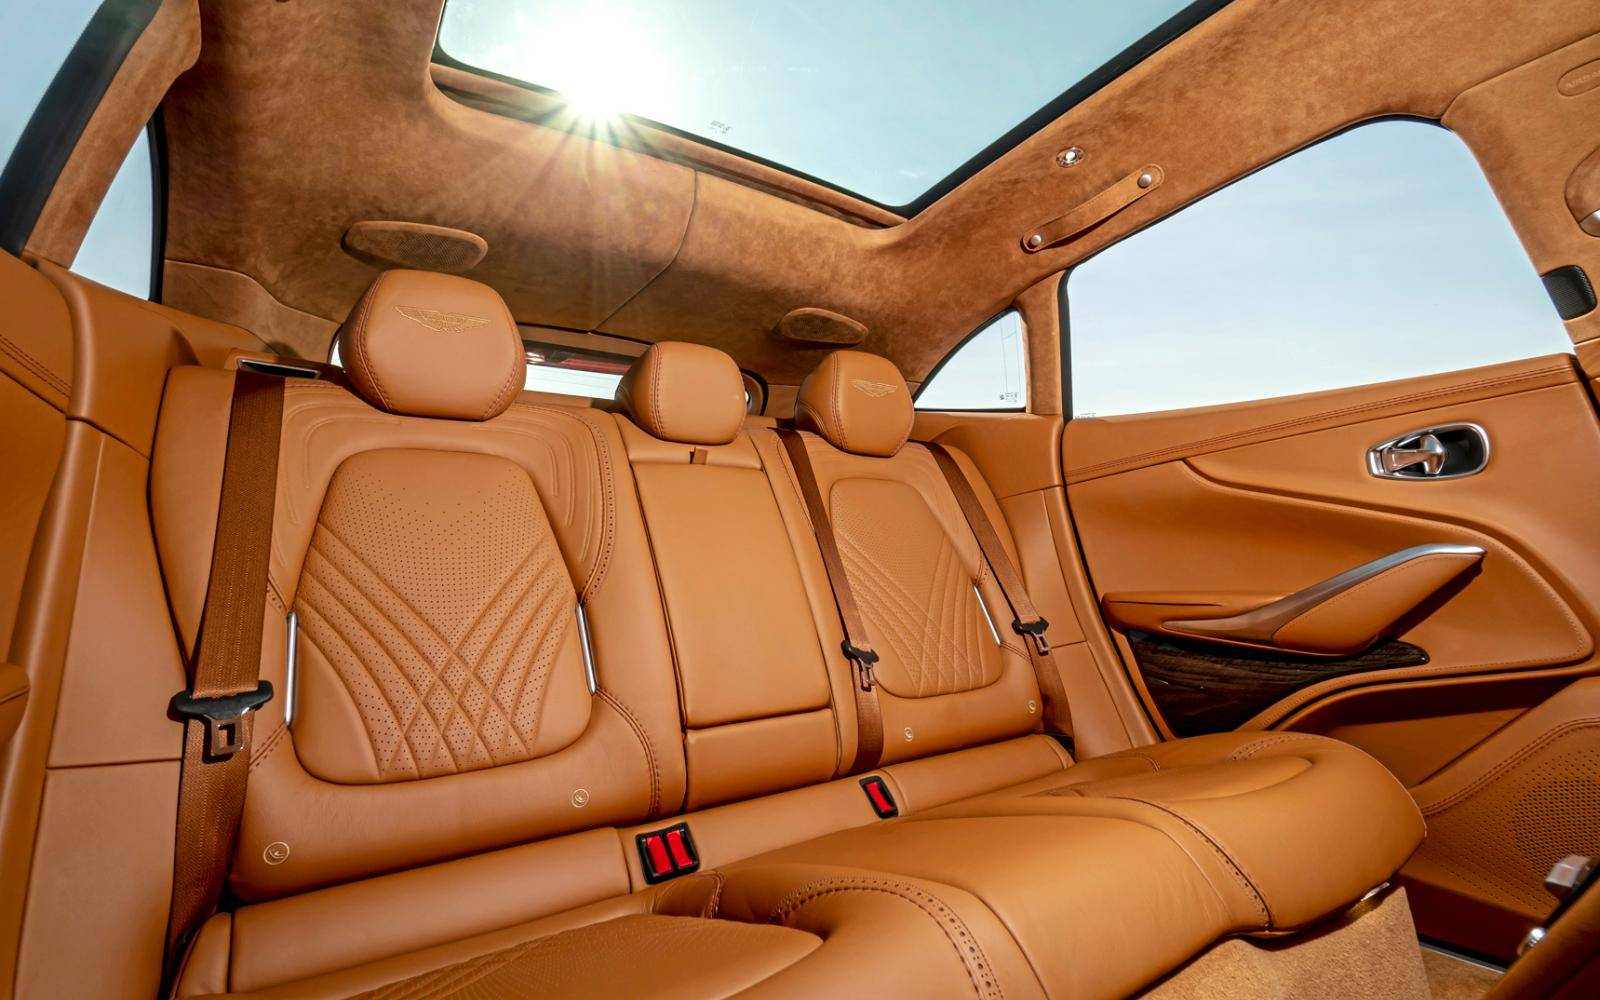 TEST - De chique Aston Martin DBX is 'fashionably late'